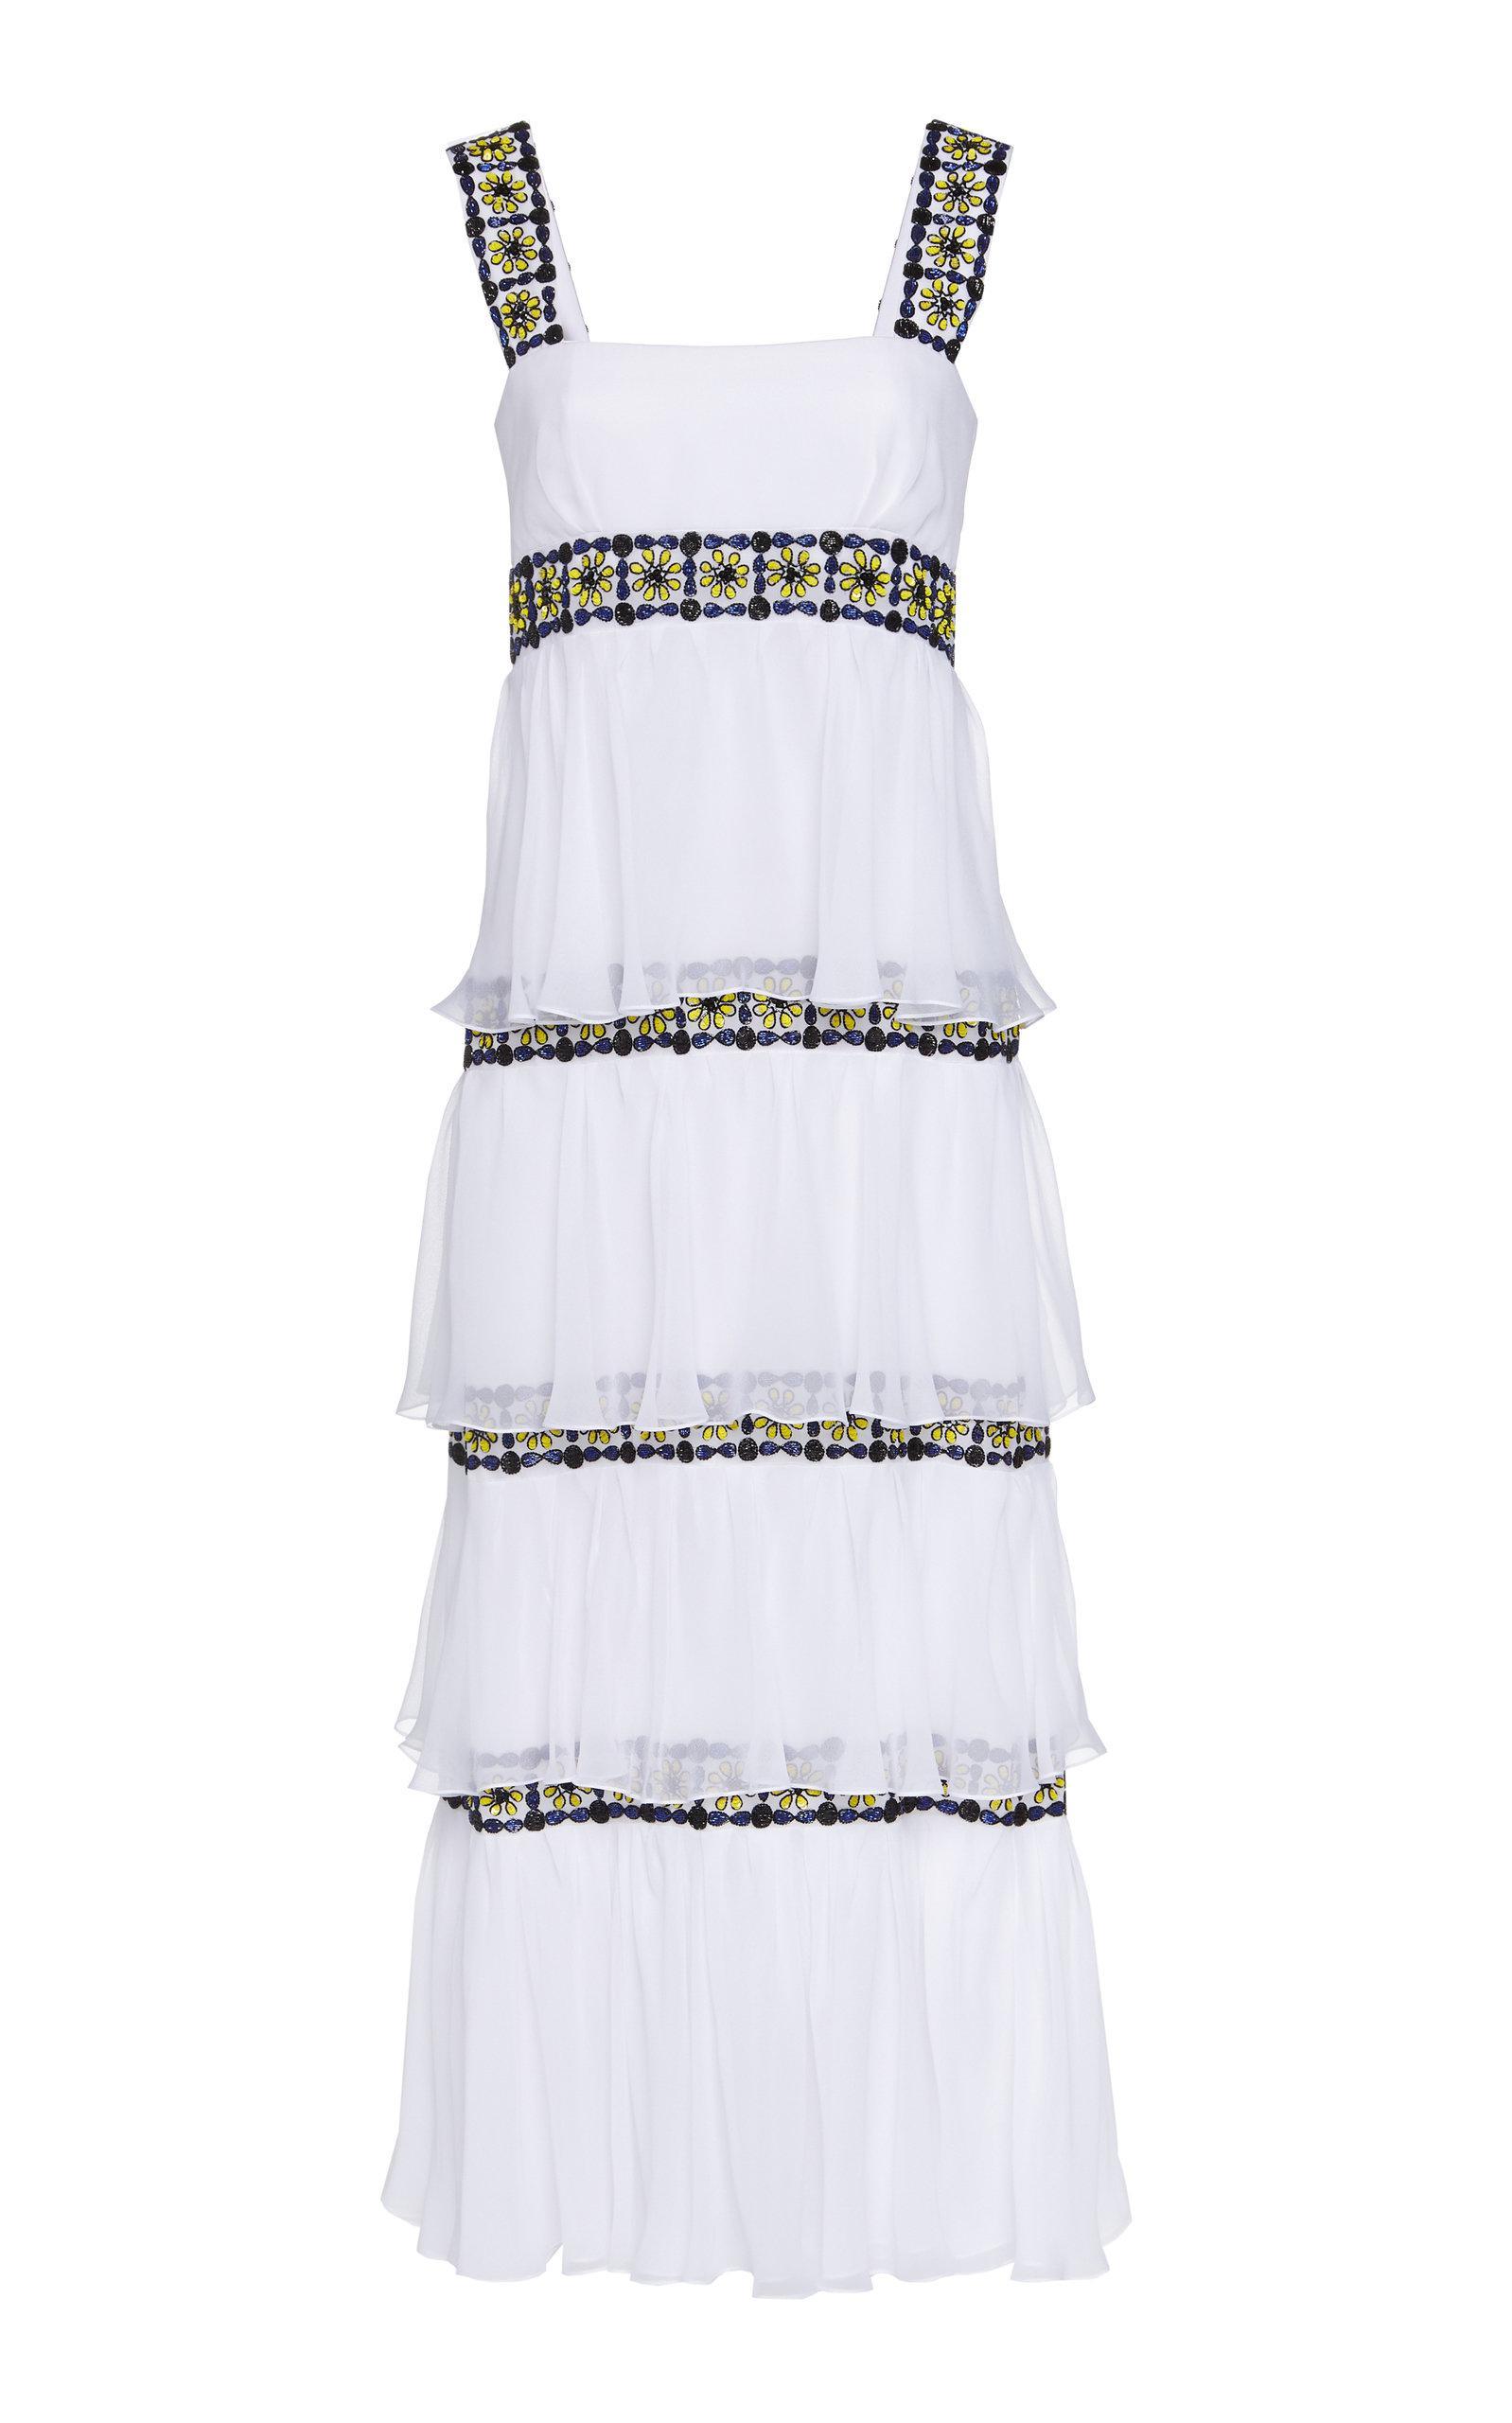 Tiered Mosaic Dress Carolina Herrera 9mnWWY7d4e